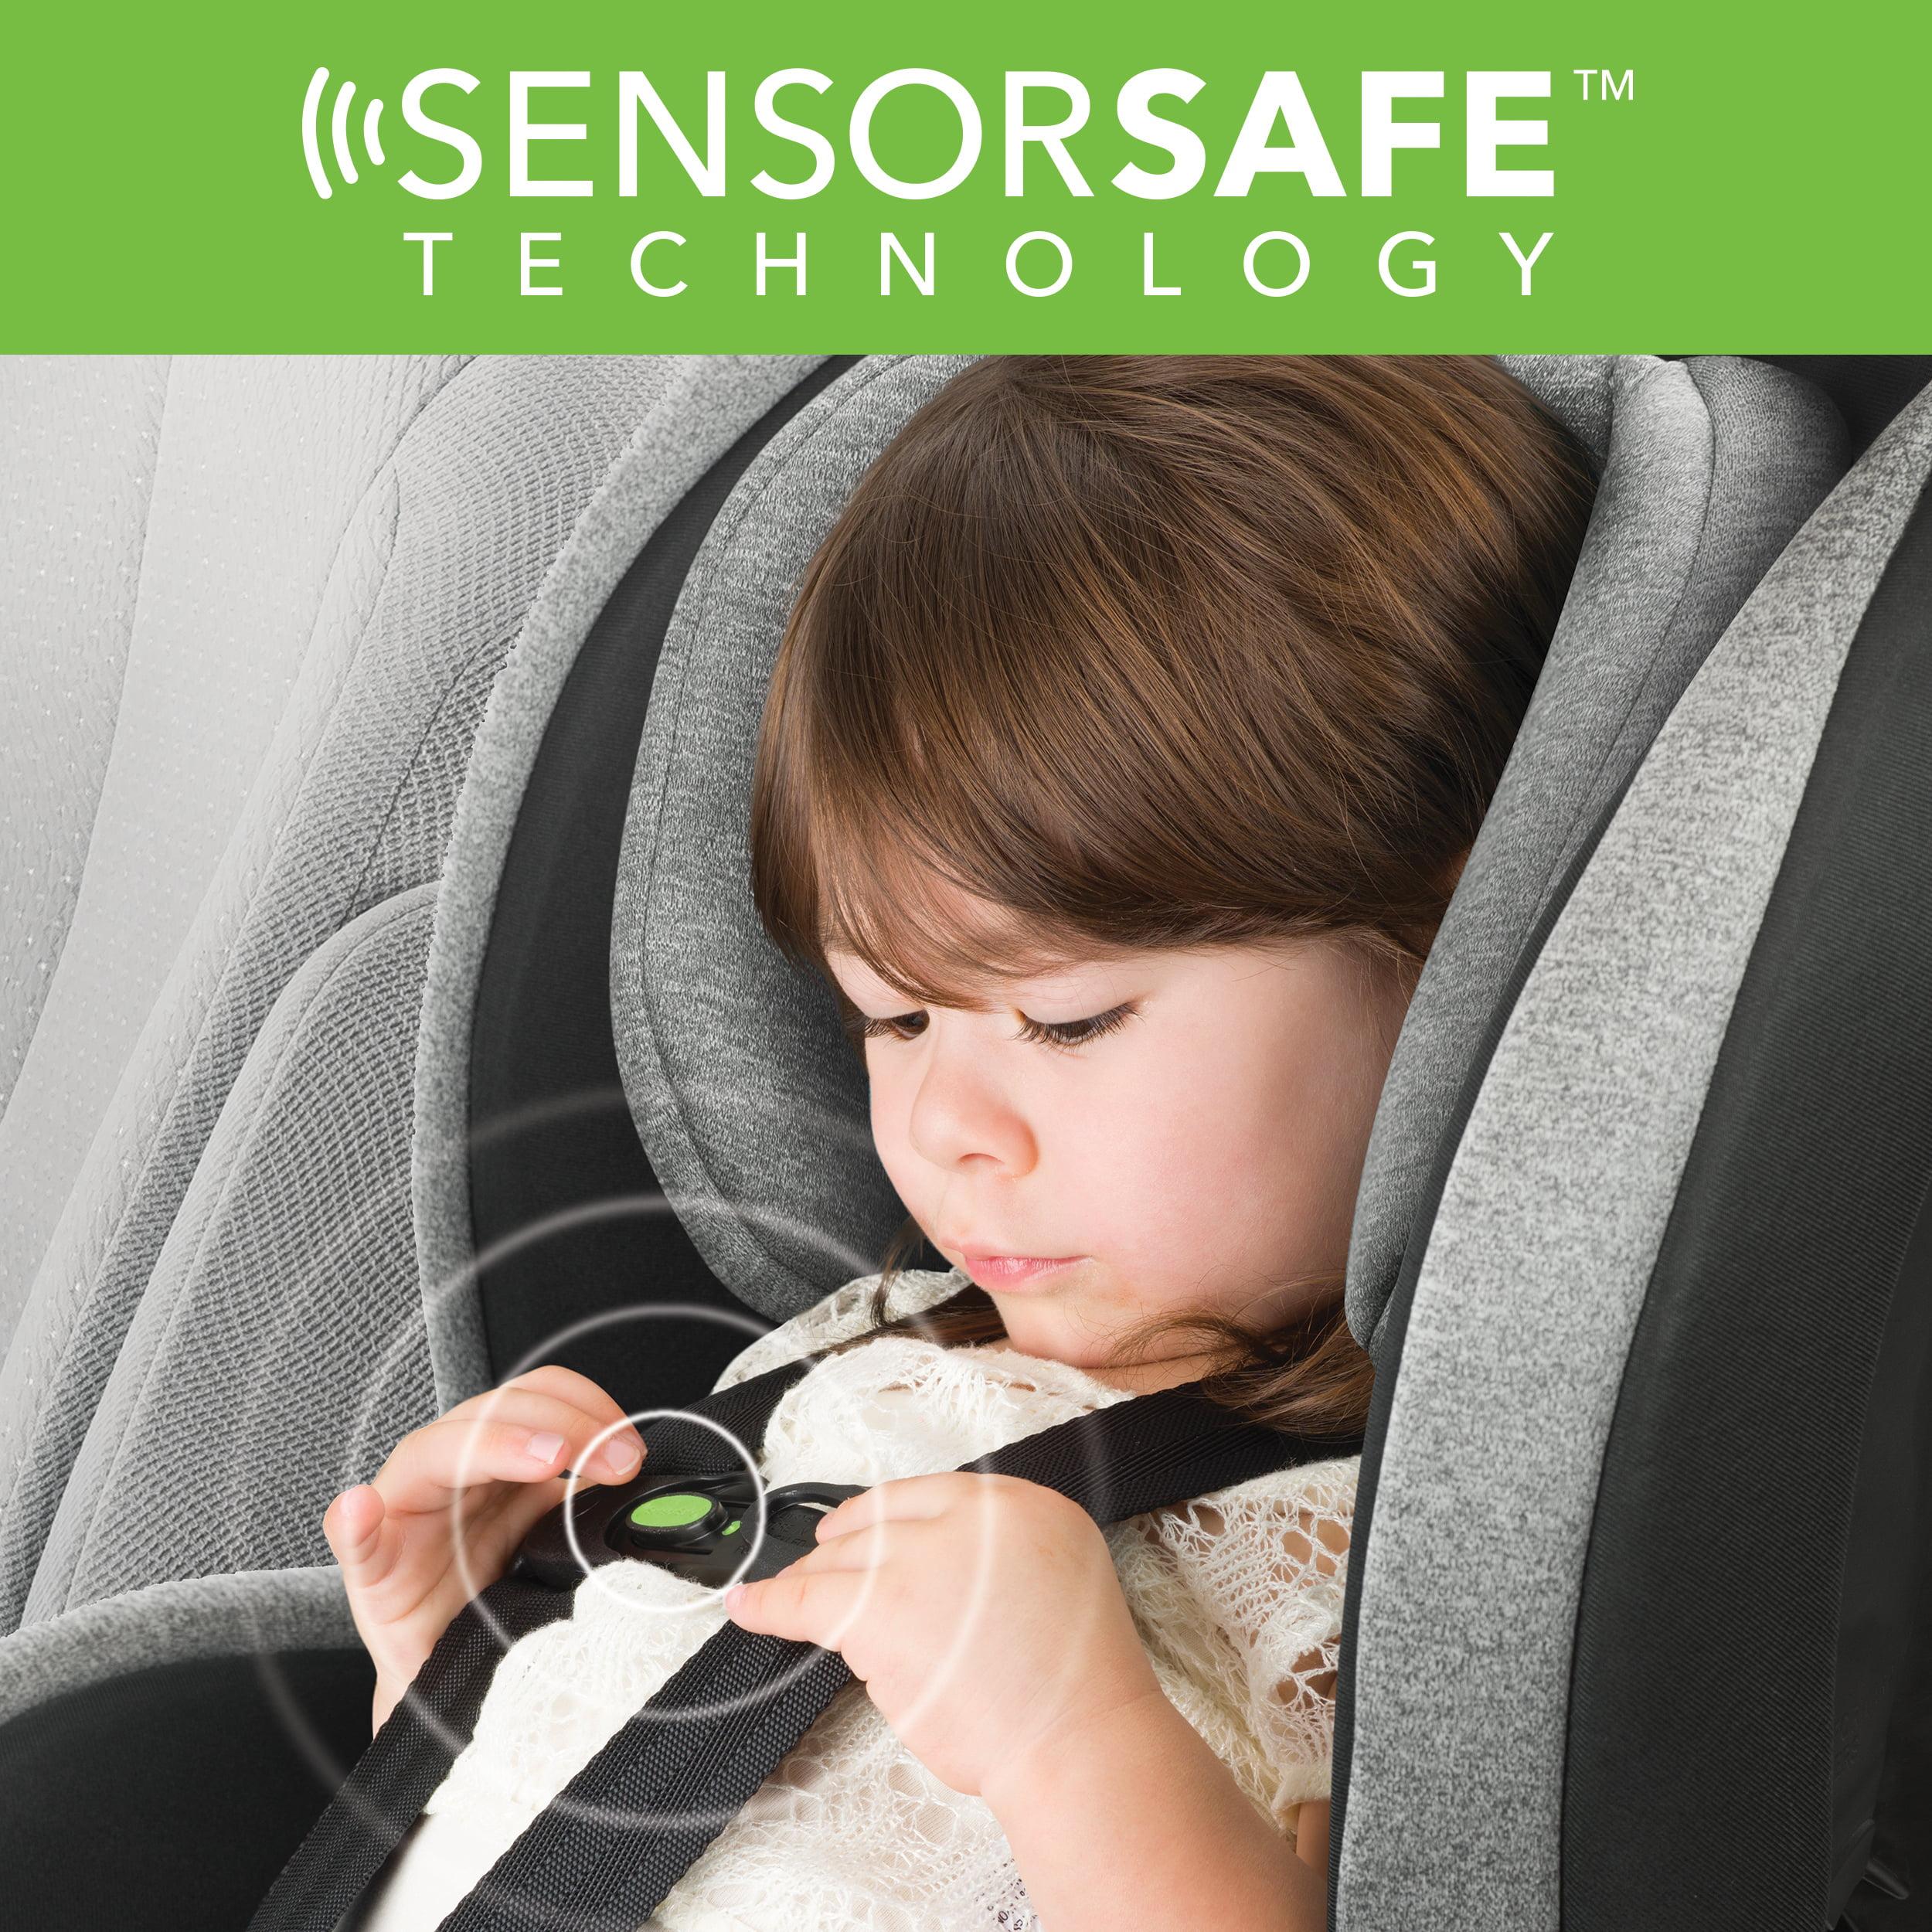 Evenflo Advanced Litemax Infant Car Seat Raven Lilac Walmart Com Walmart Com